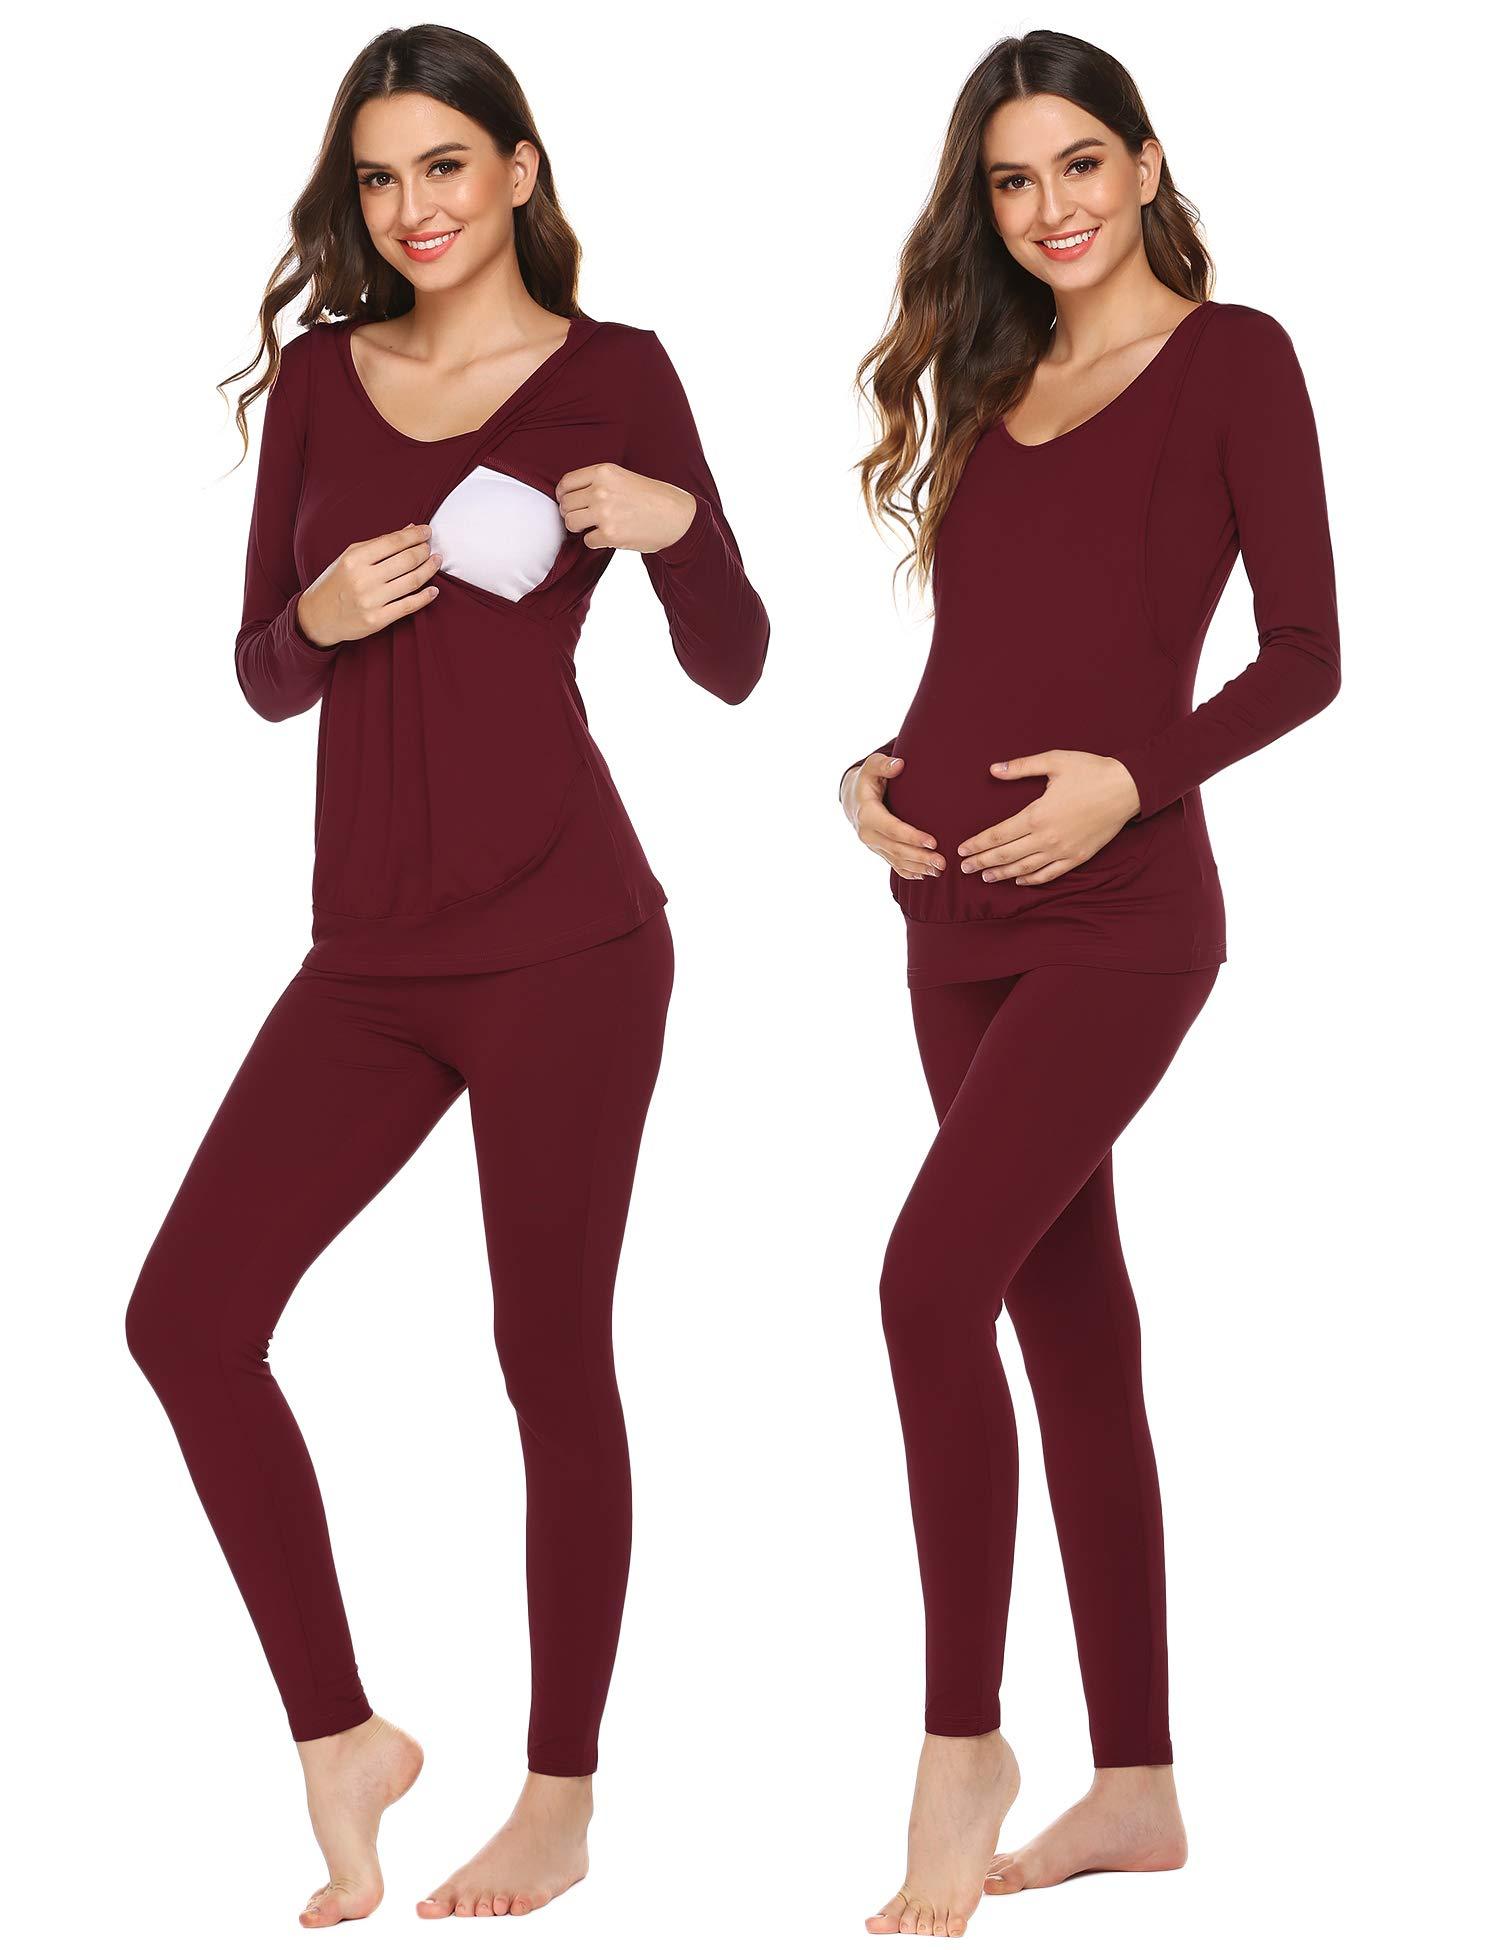 Ekouaer Breastfeeding Thermal Underwear Set Ultra Soft Nursing Pajamas Set for Women (Wine Red, XX-Large) by Ekouaer